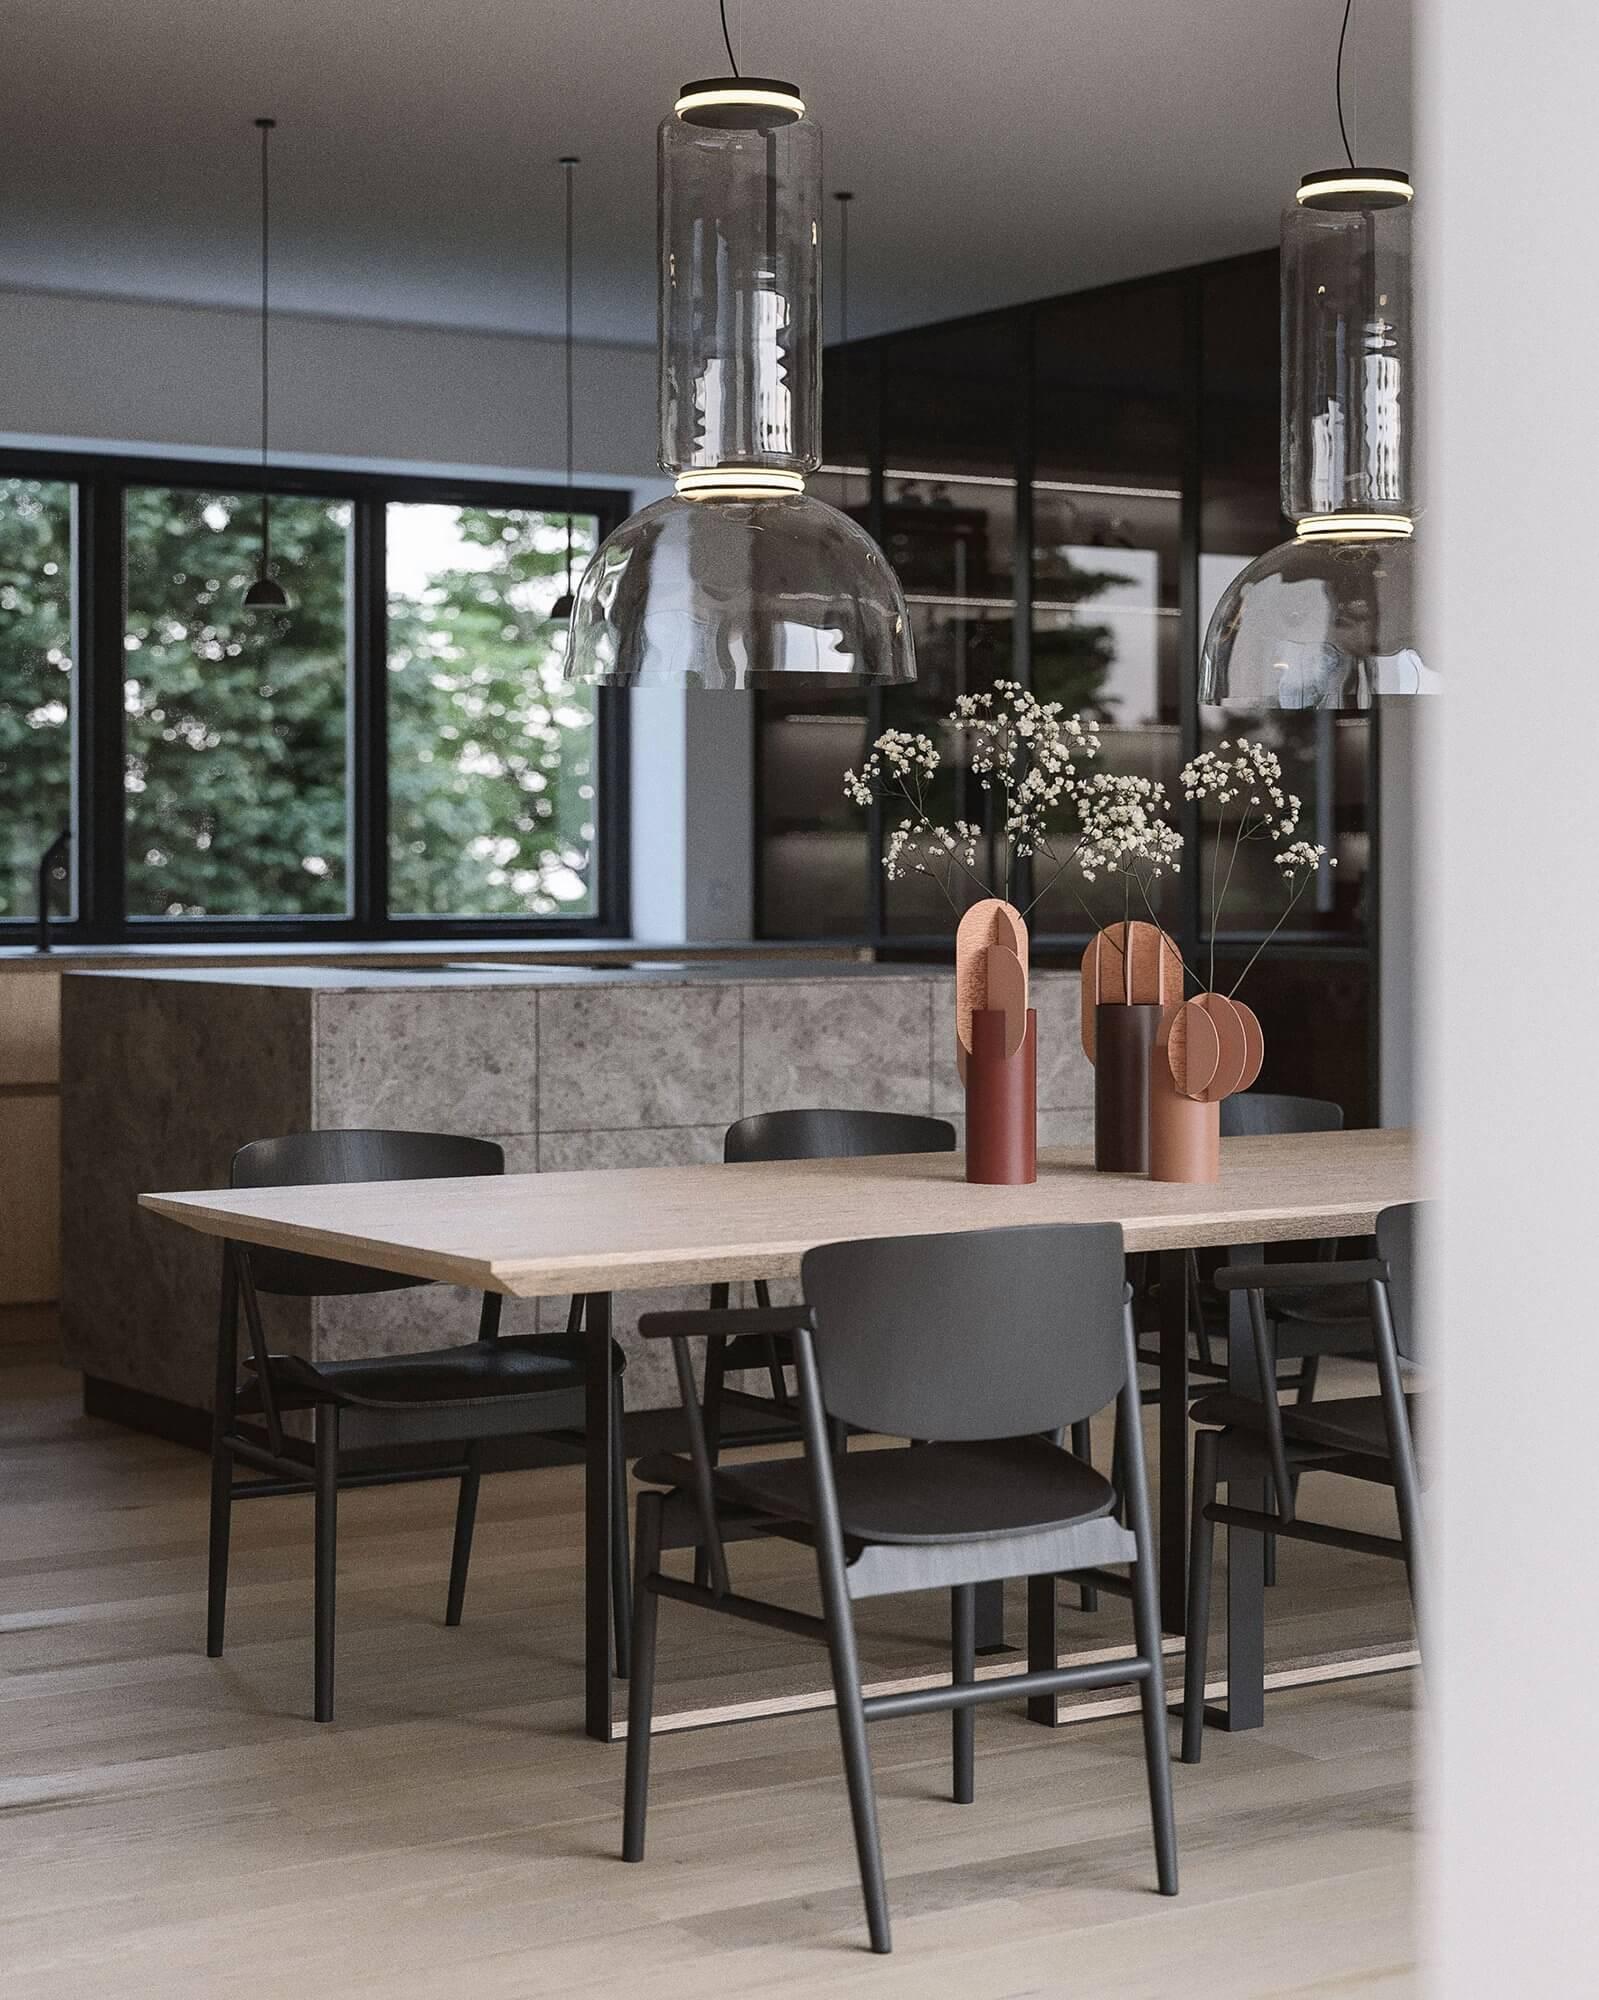 Suprematic Simplicity Apartment dining room kitchen - cgi visualization